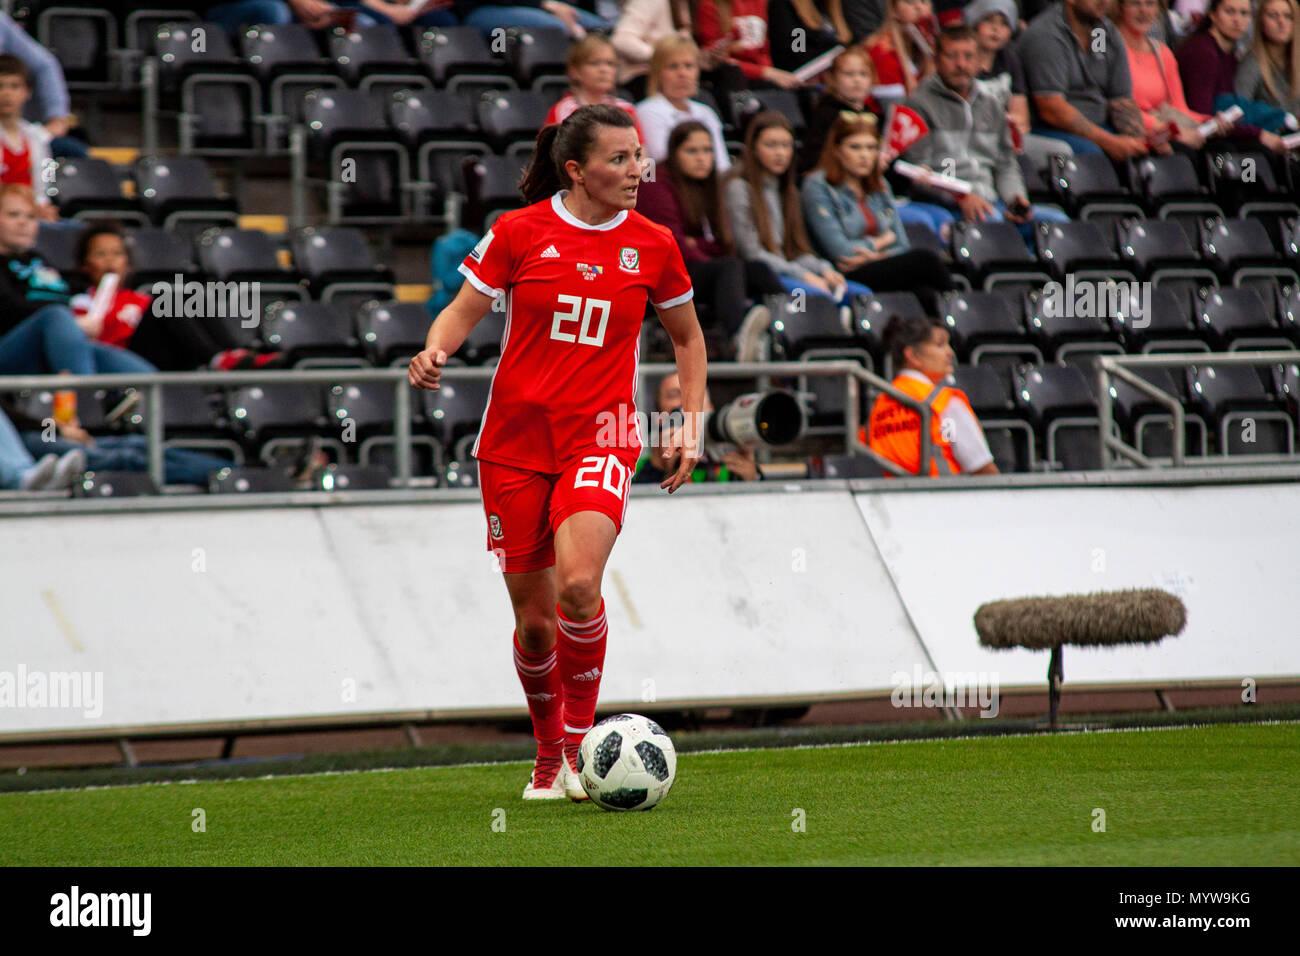 Swansea, Wales, UK. 7th June, 2018. Wales' Helen Ward faces Bosnia-Herzegovina at the Liberty Stadium. Lewis Mitchell/Alamy Live News. - Stock Image